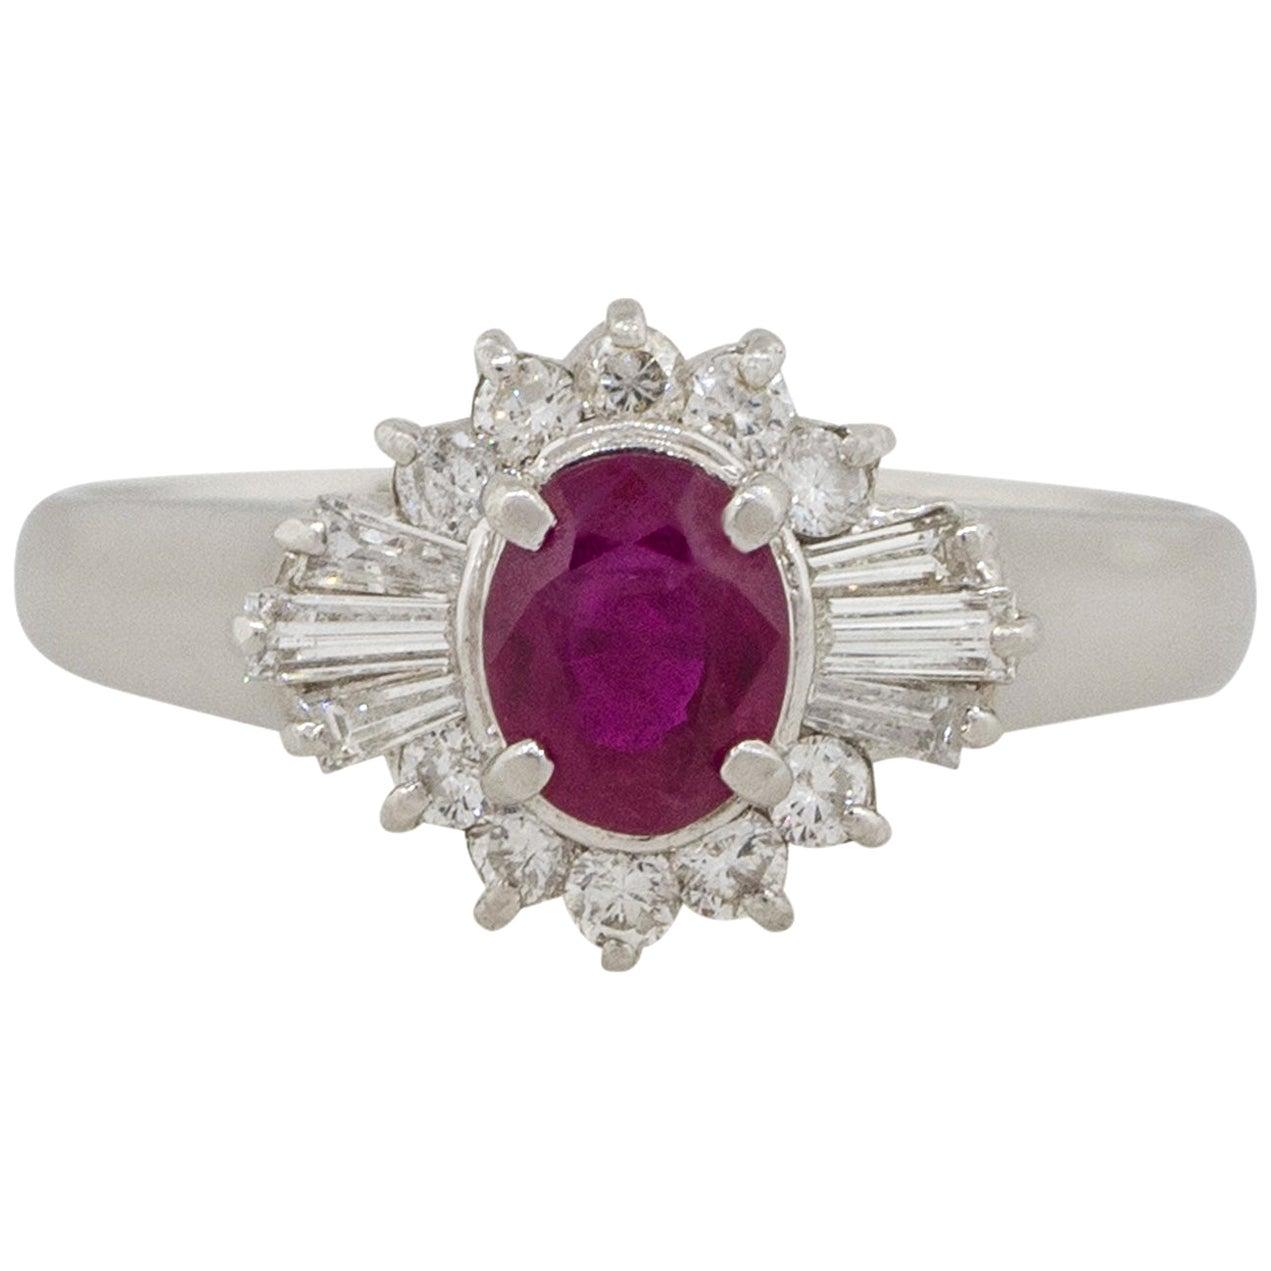 0.70 Carat Bezel Set Oval Cut Ruby Diamond Cocktail Ring Platinum in Stock